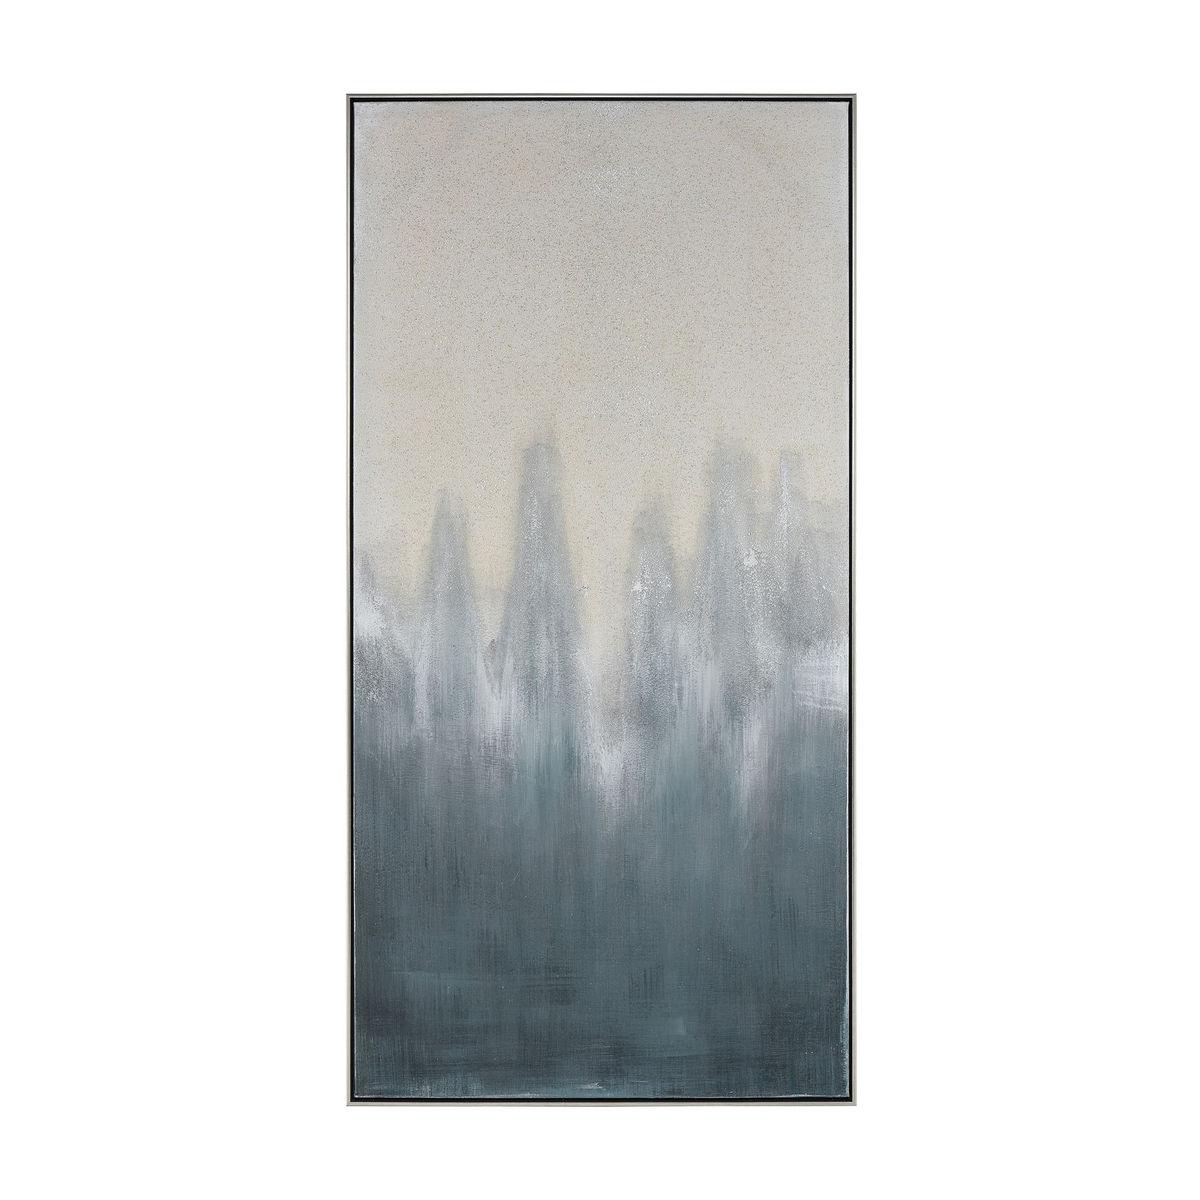 Dark Crash Wall Decor In Grey And Cream